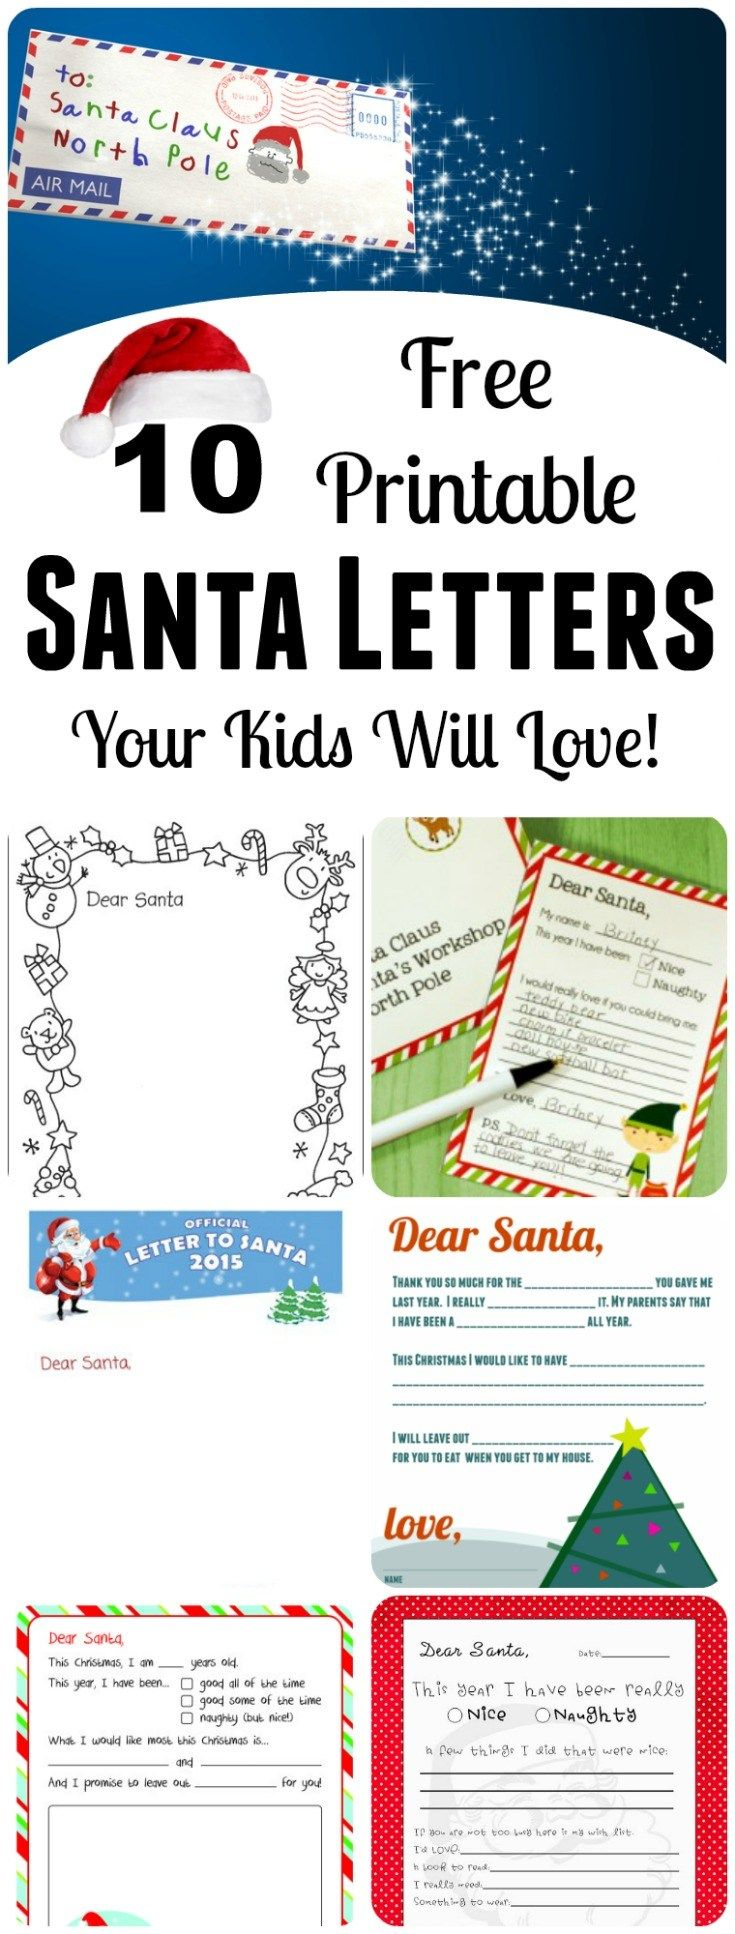 Santa Letters 10 Free Printable Letters To Santa Pinterest